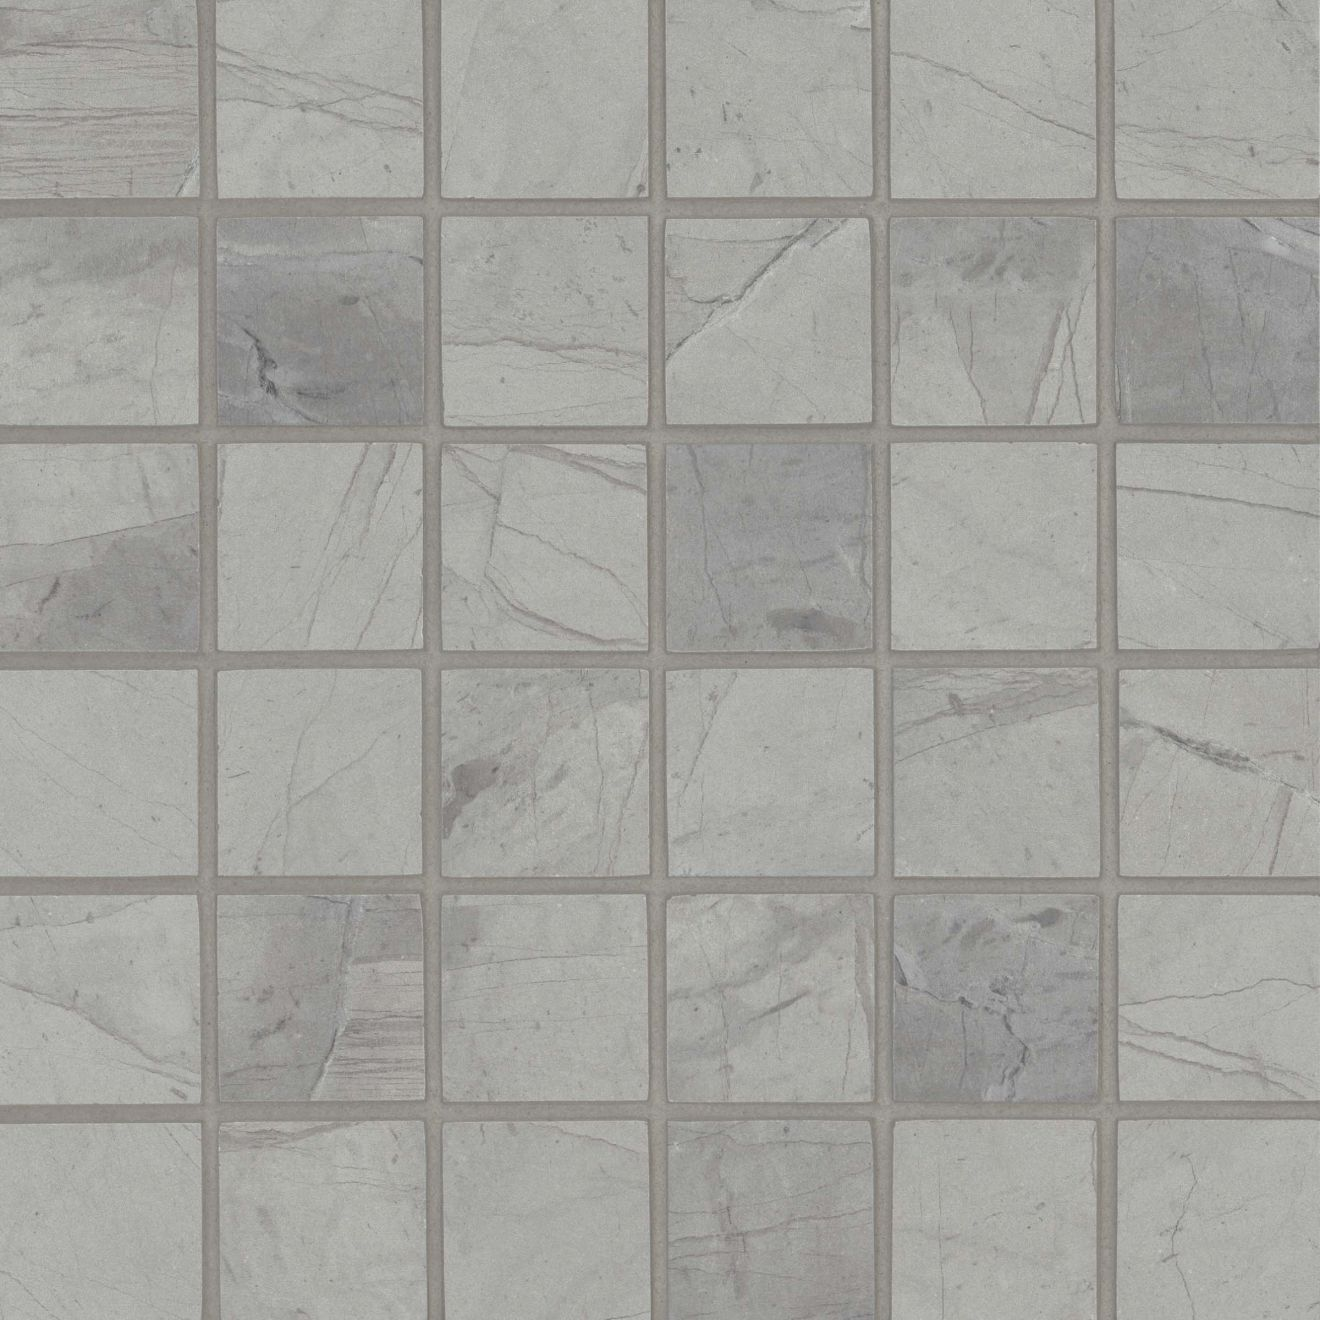 Tesoro Wall Mosaic in Light Grey